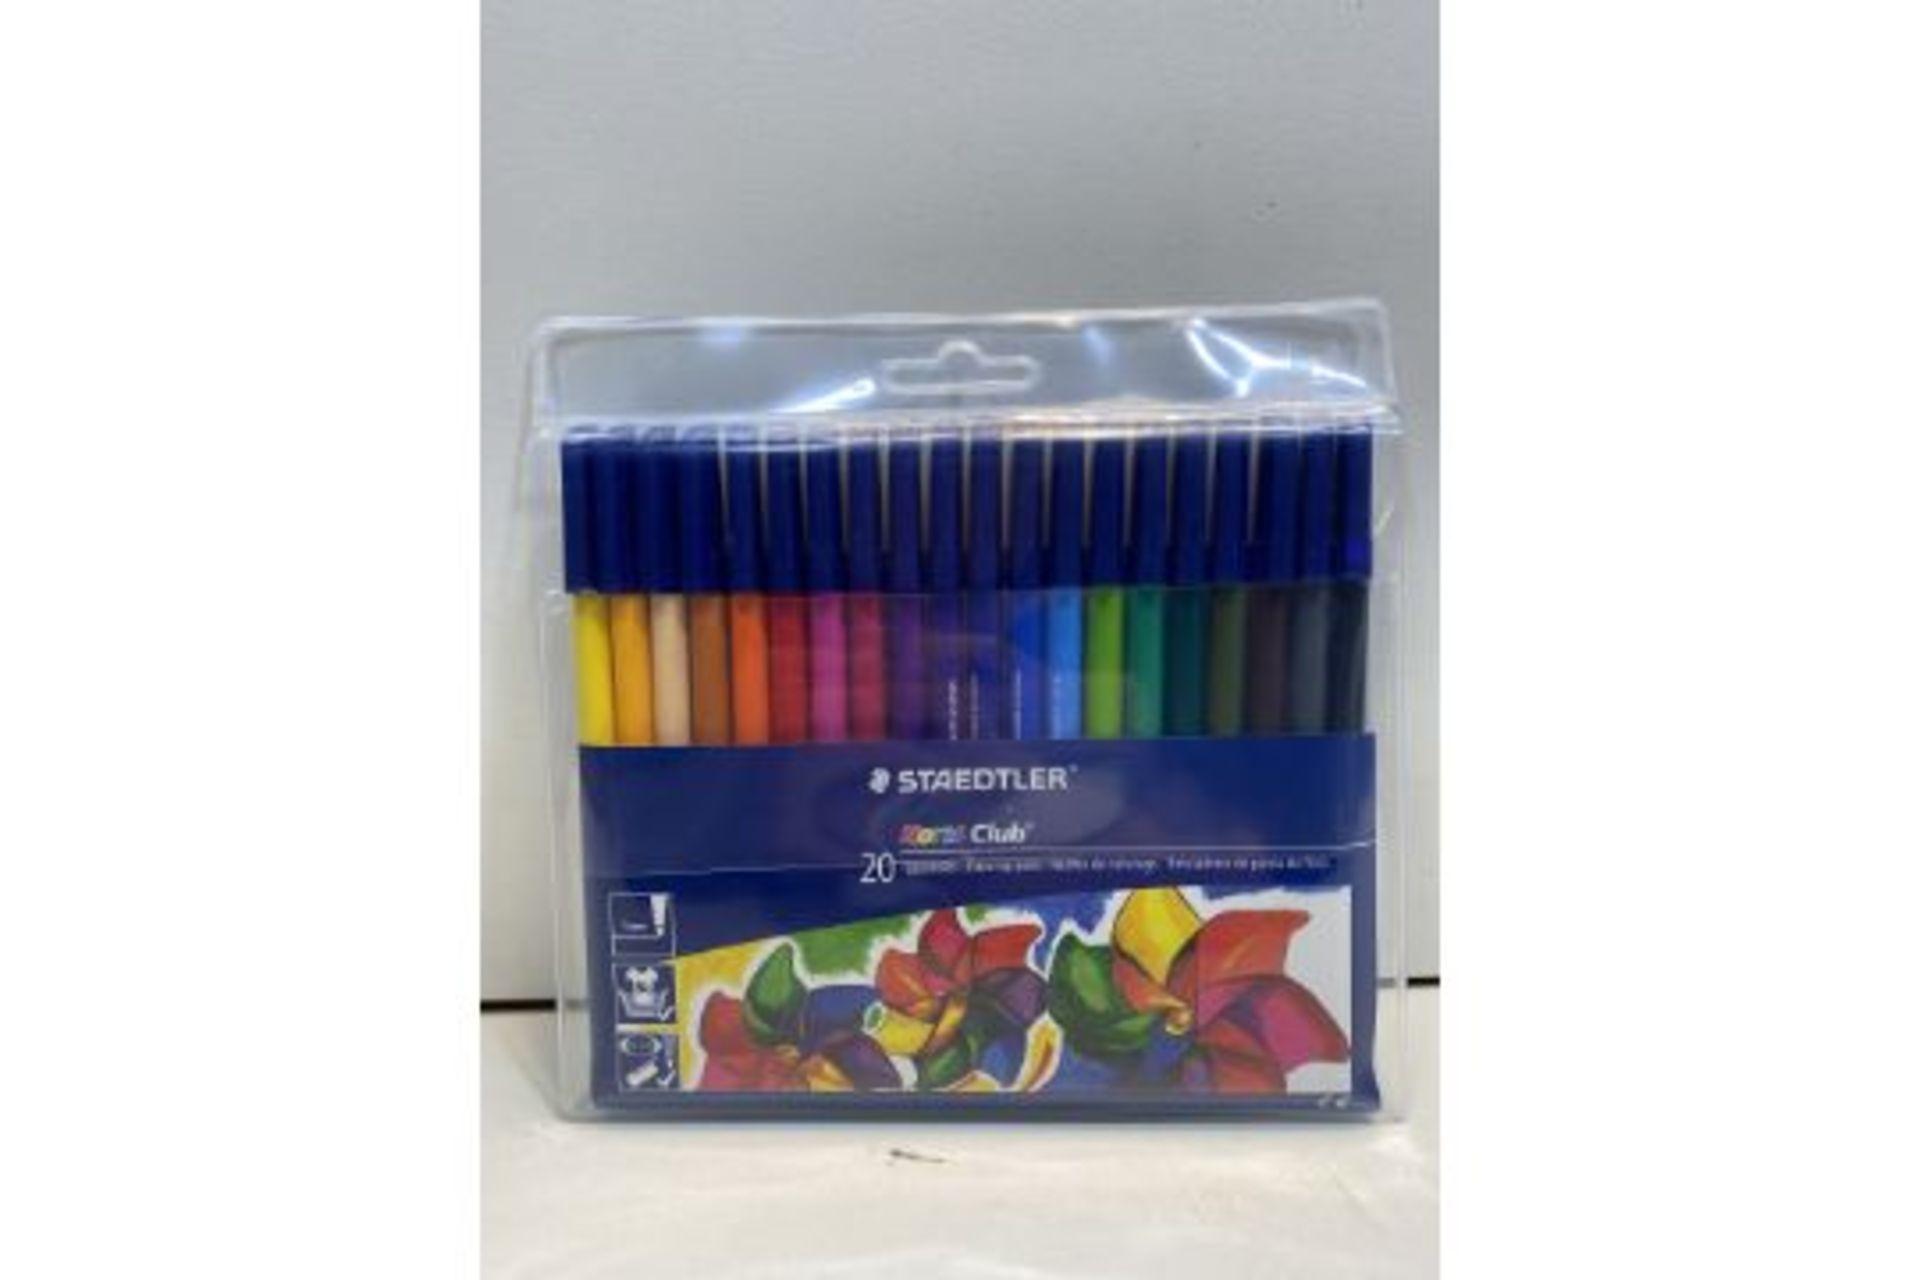 5 x Staedtler Noris Club Fibre Tipped Pens - Pack of 20   4007817339664